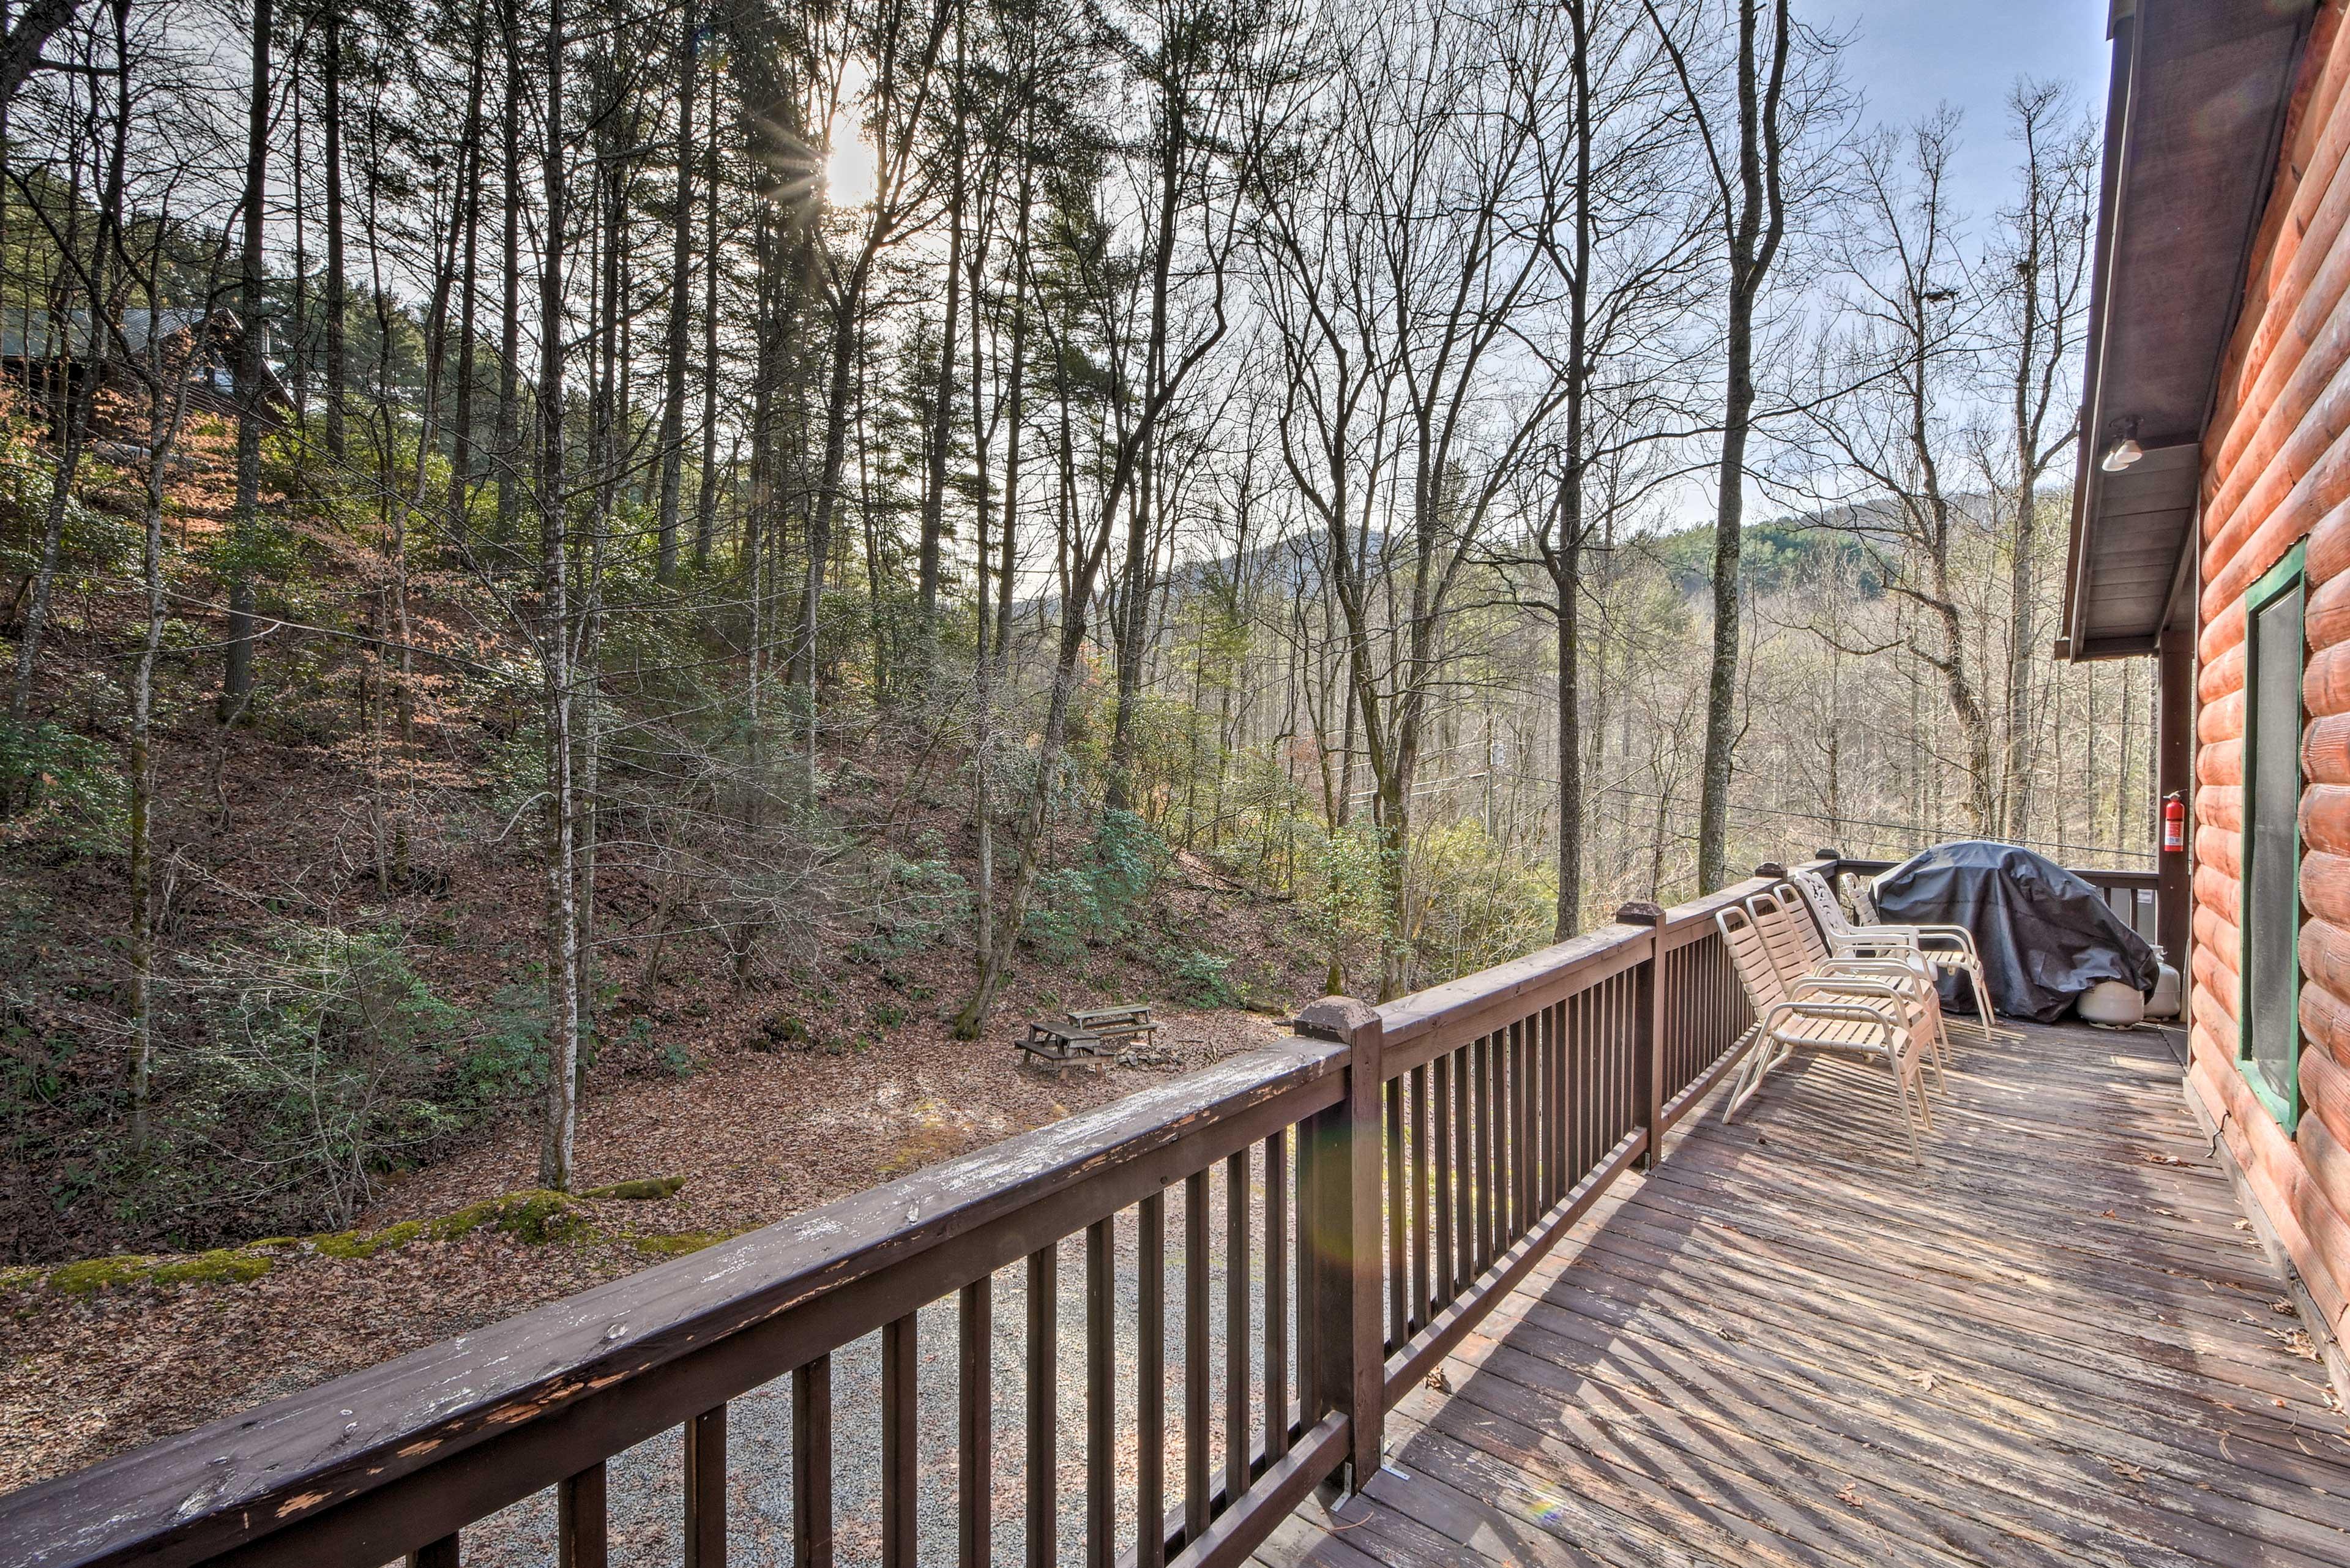 Wraparound Deck   Natural Views   Gas Grill